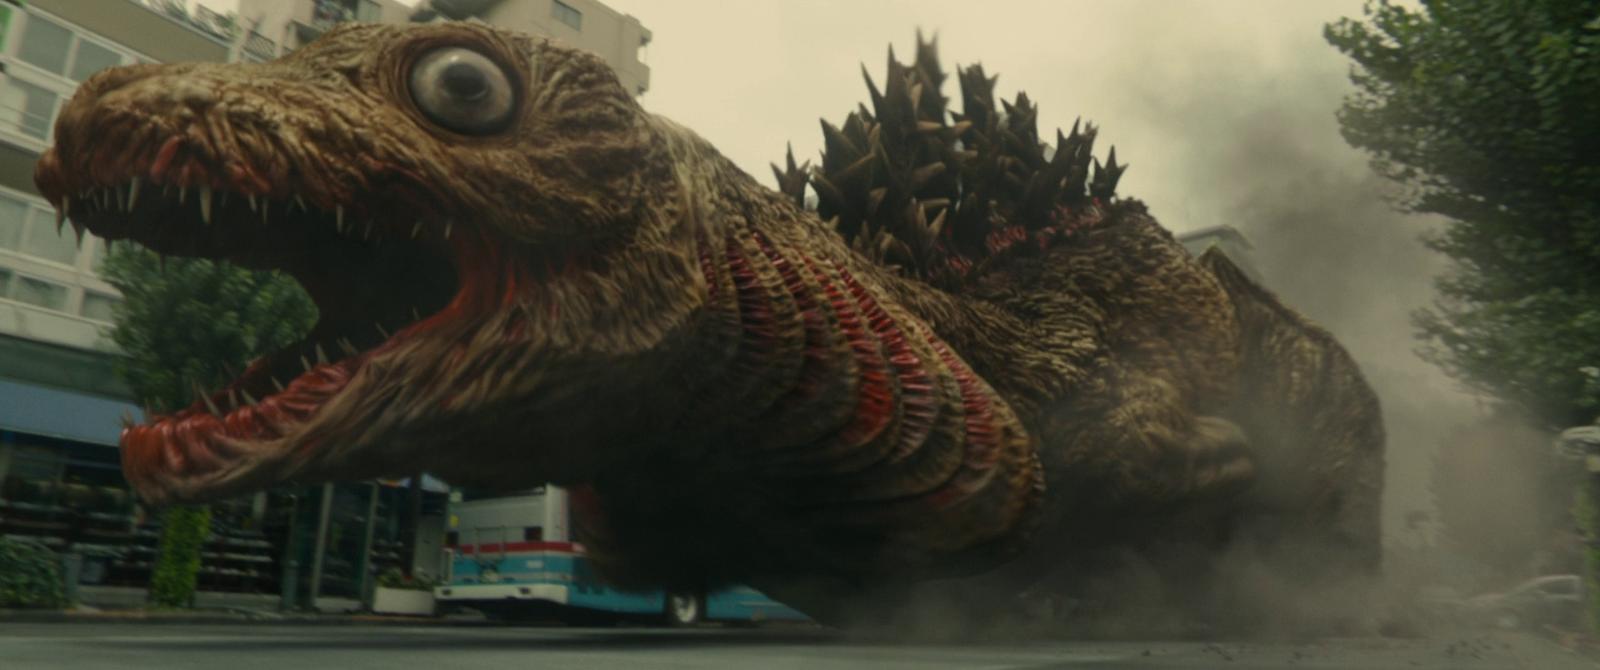 The Weirdest Godzilla Moments from the Toho Movies | Den ...